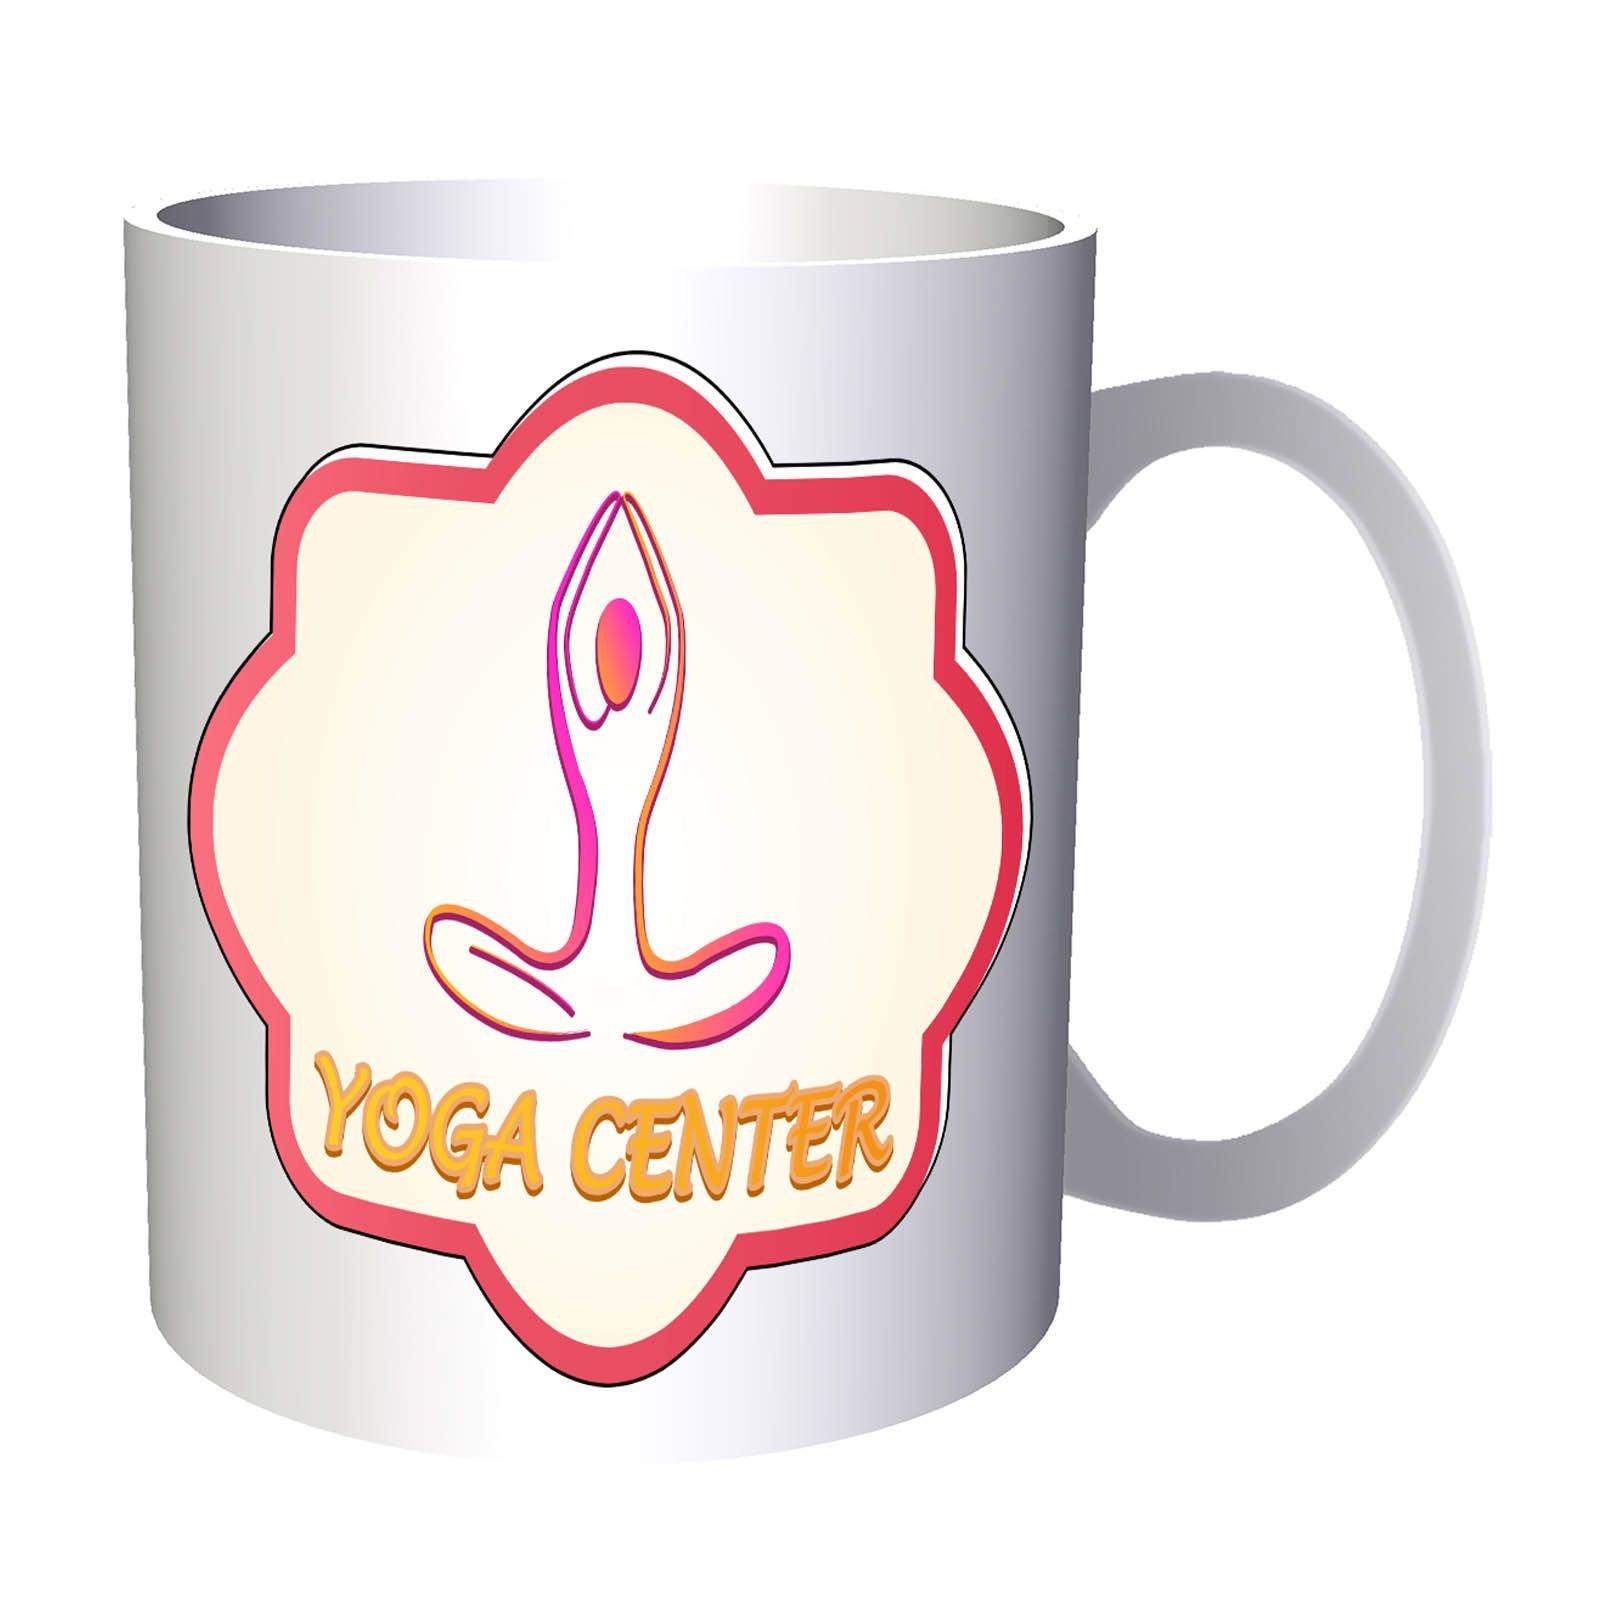 Yoga Center Beauty Spa 11oz Mug o690